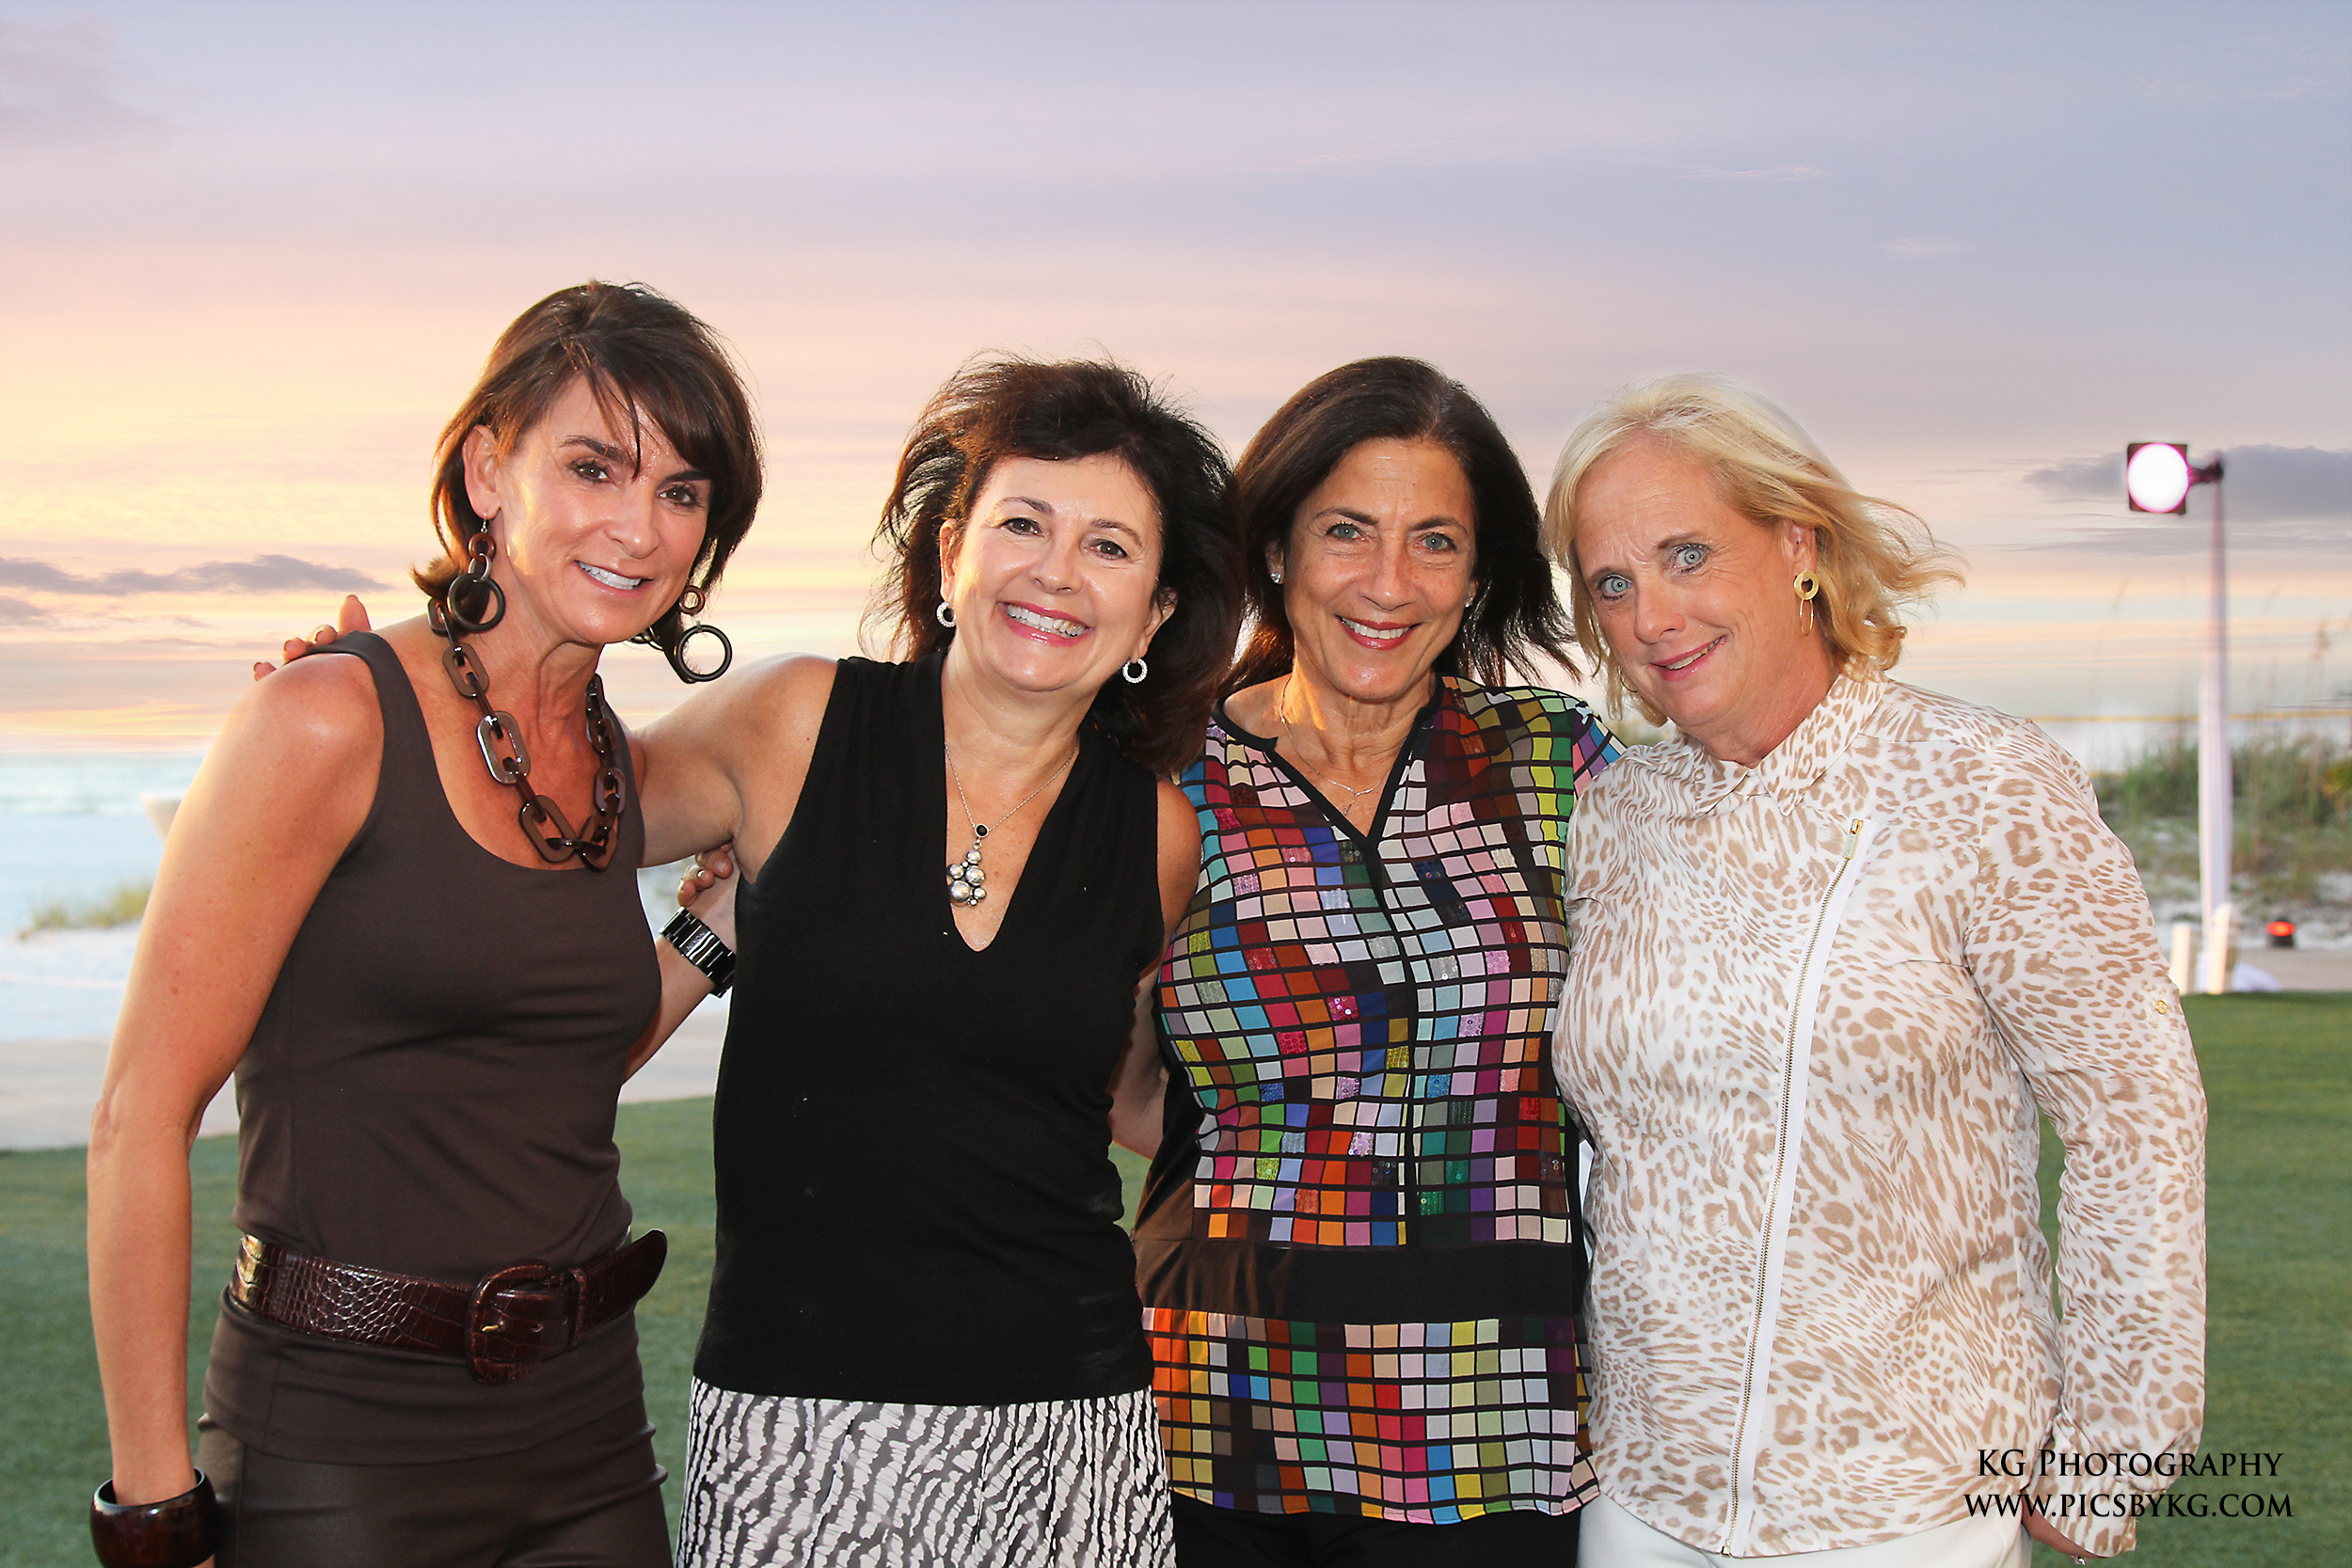 Pam-Rueve-Lori-Rowe-Elizabeth-Ballis-Anne-DuBray.jpg